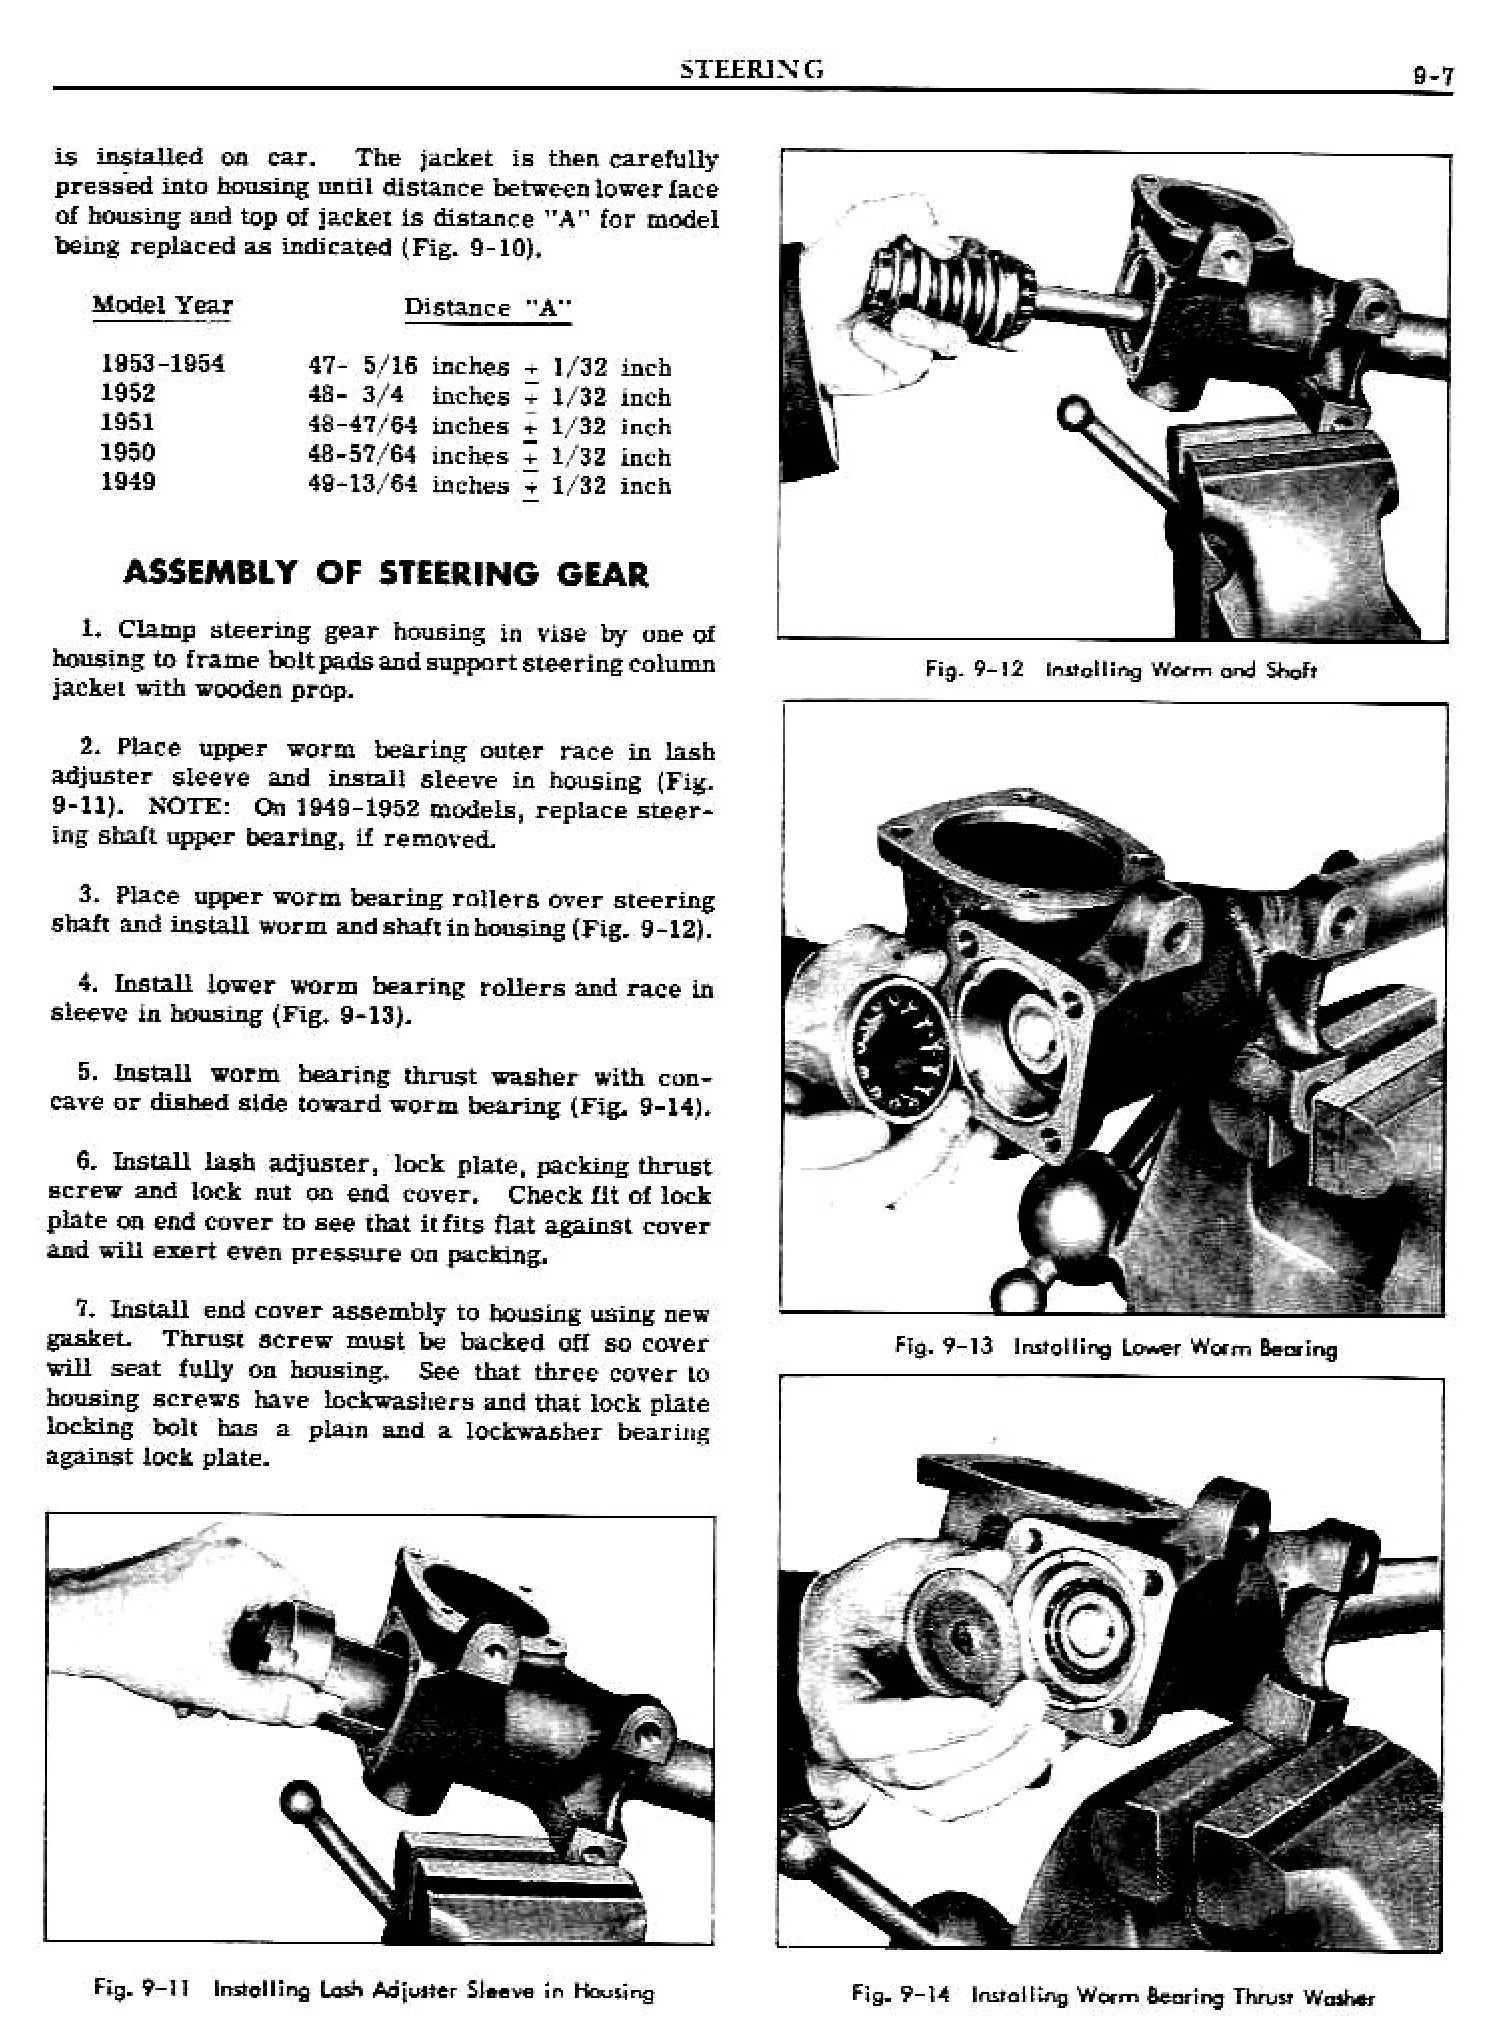 1949 Pontiac Shop Manual- Steering Page 7 of 31